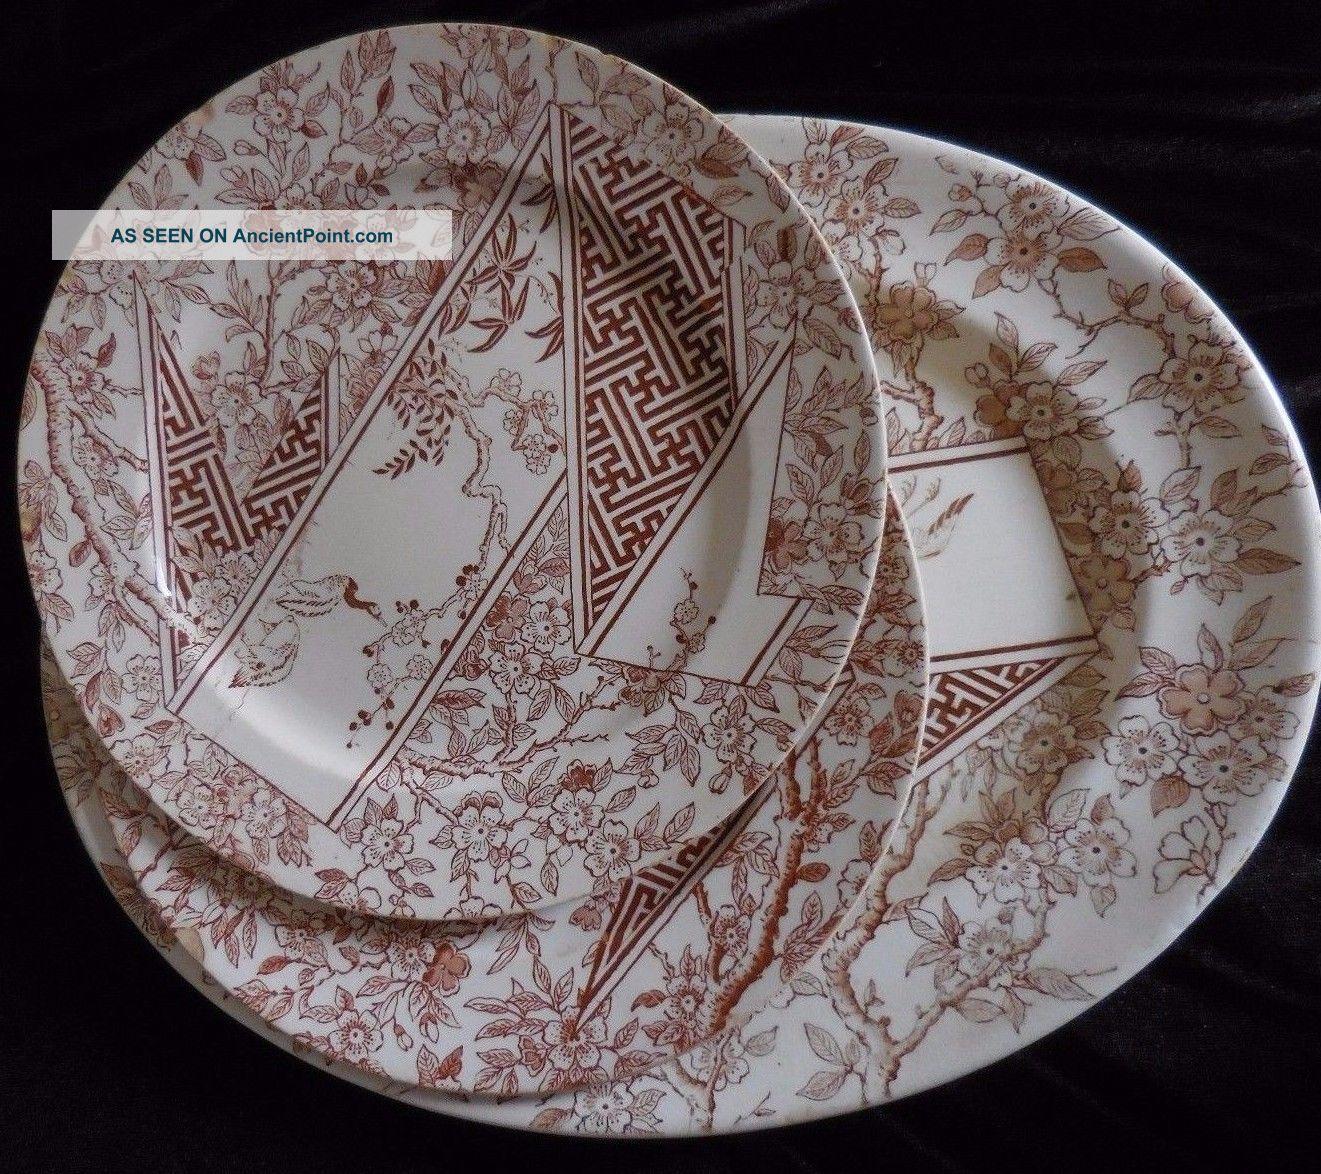 Rare Antique Doulton u0027 S Burslem 1883 Two Plates And Oval Platter Transferware & Rare Antique Doulton u0027 S Burslem 1883 Two Plates And Oval Platter ...